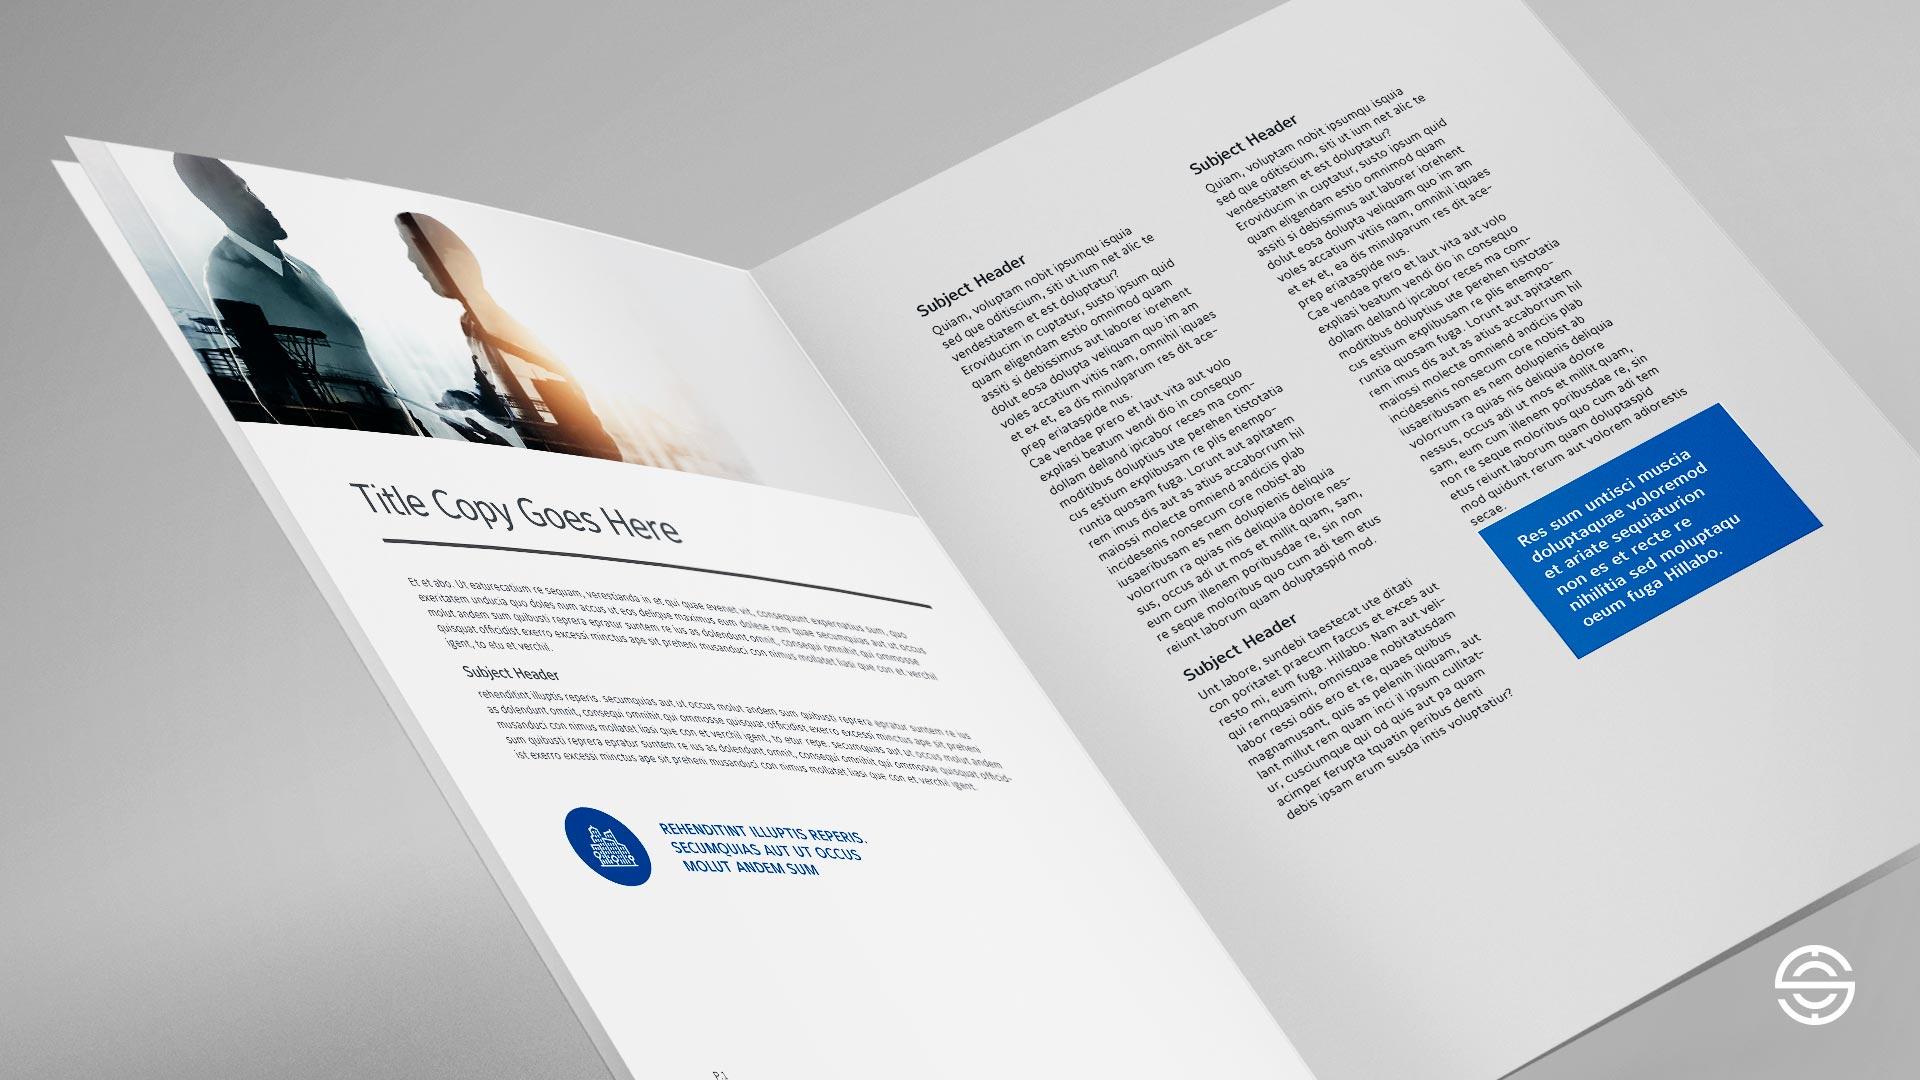 Proposed Johnson Controls Digital Solutions spread design.